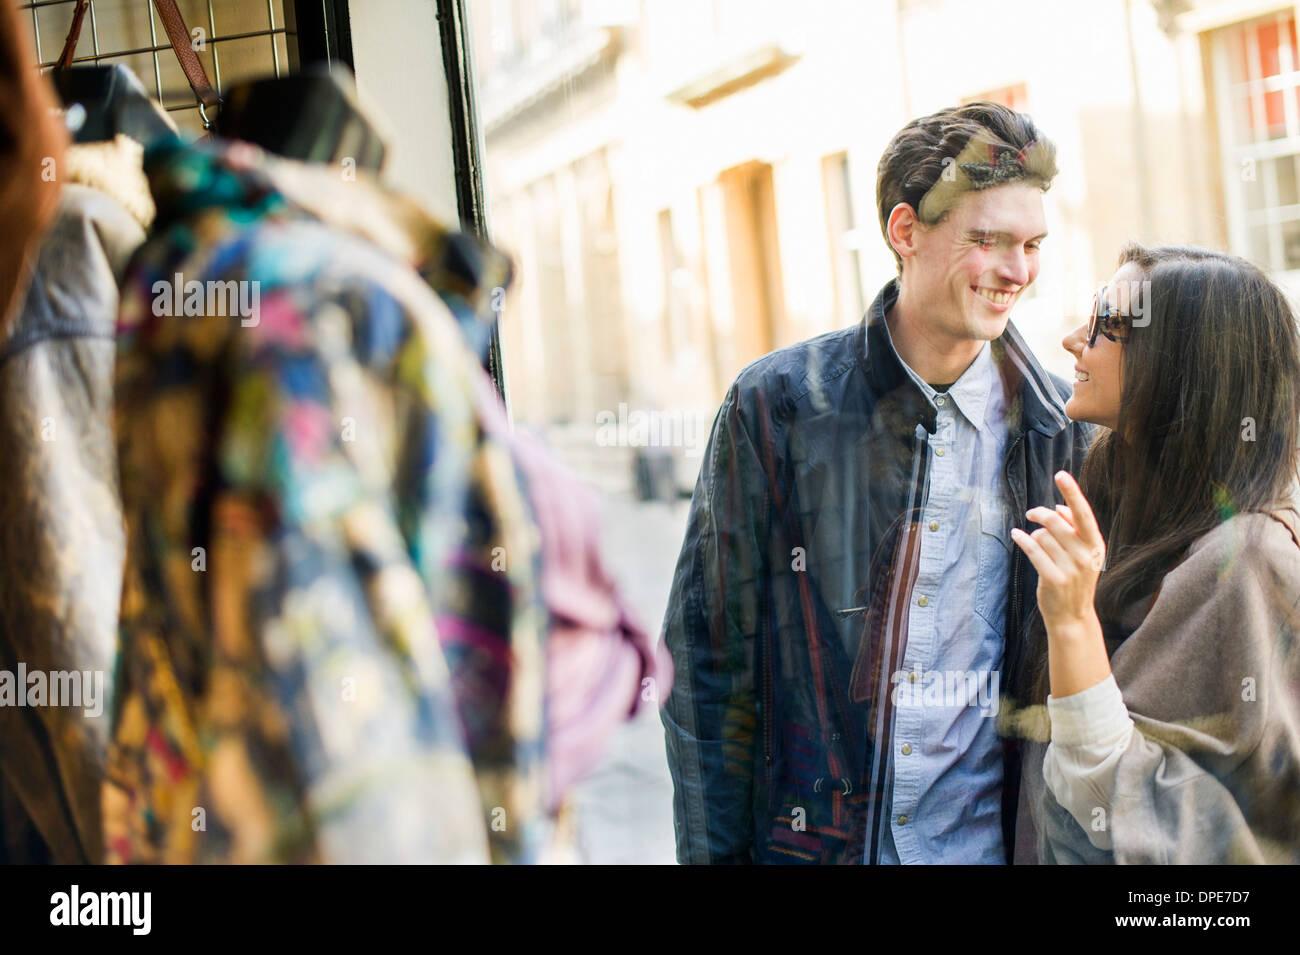 Young couple window shopping - Stock Image